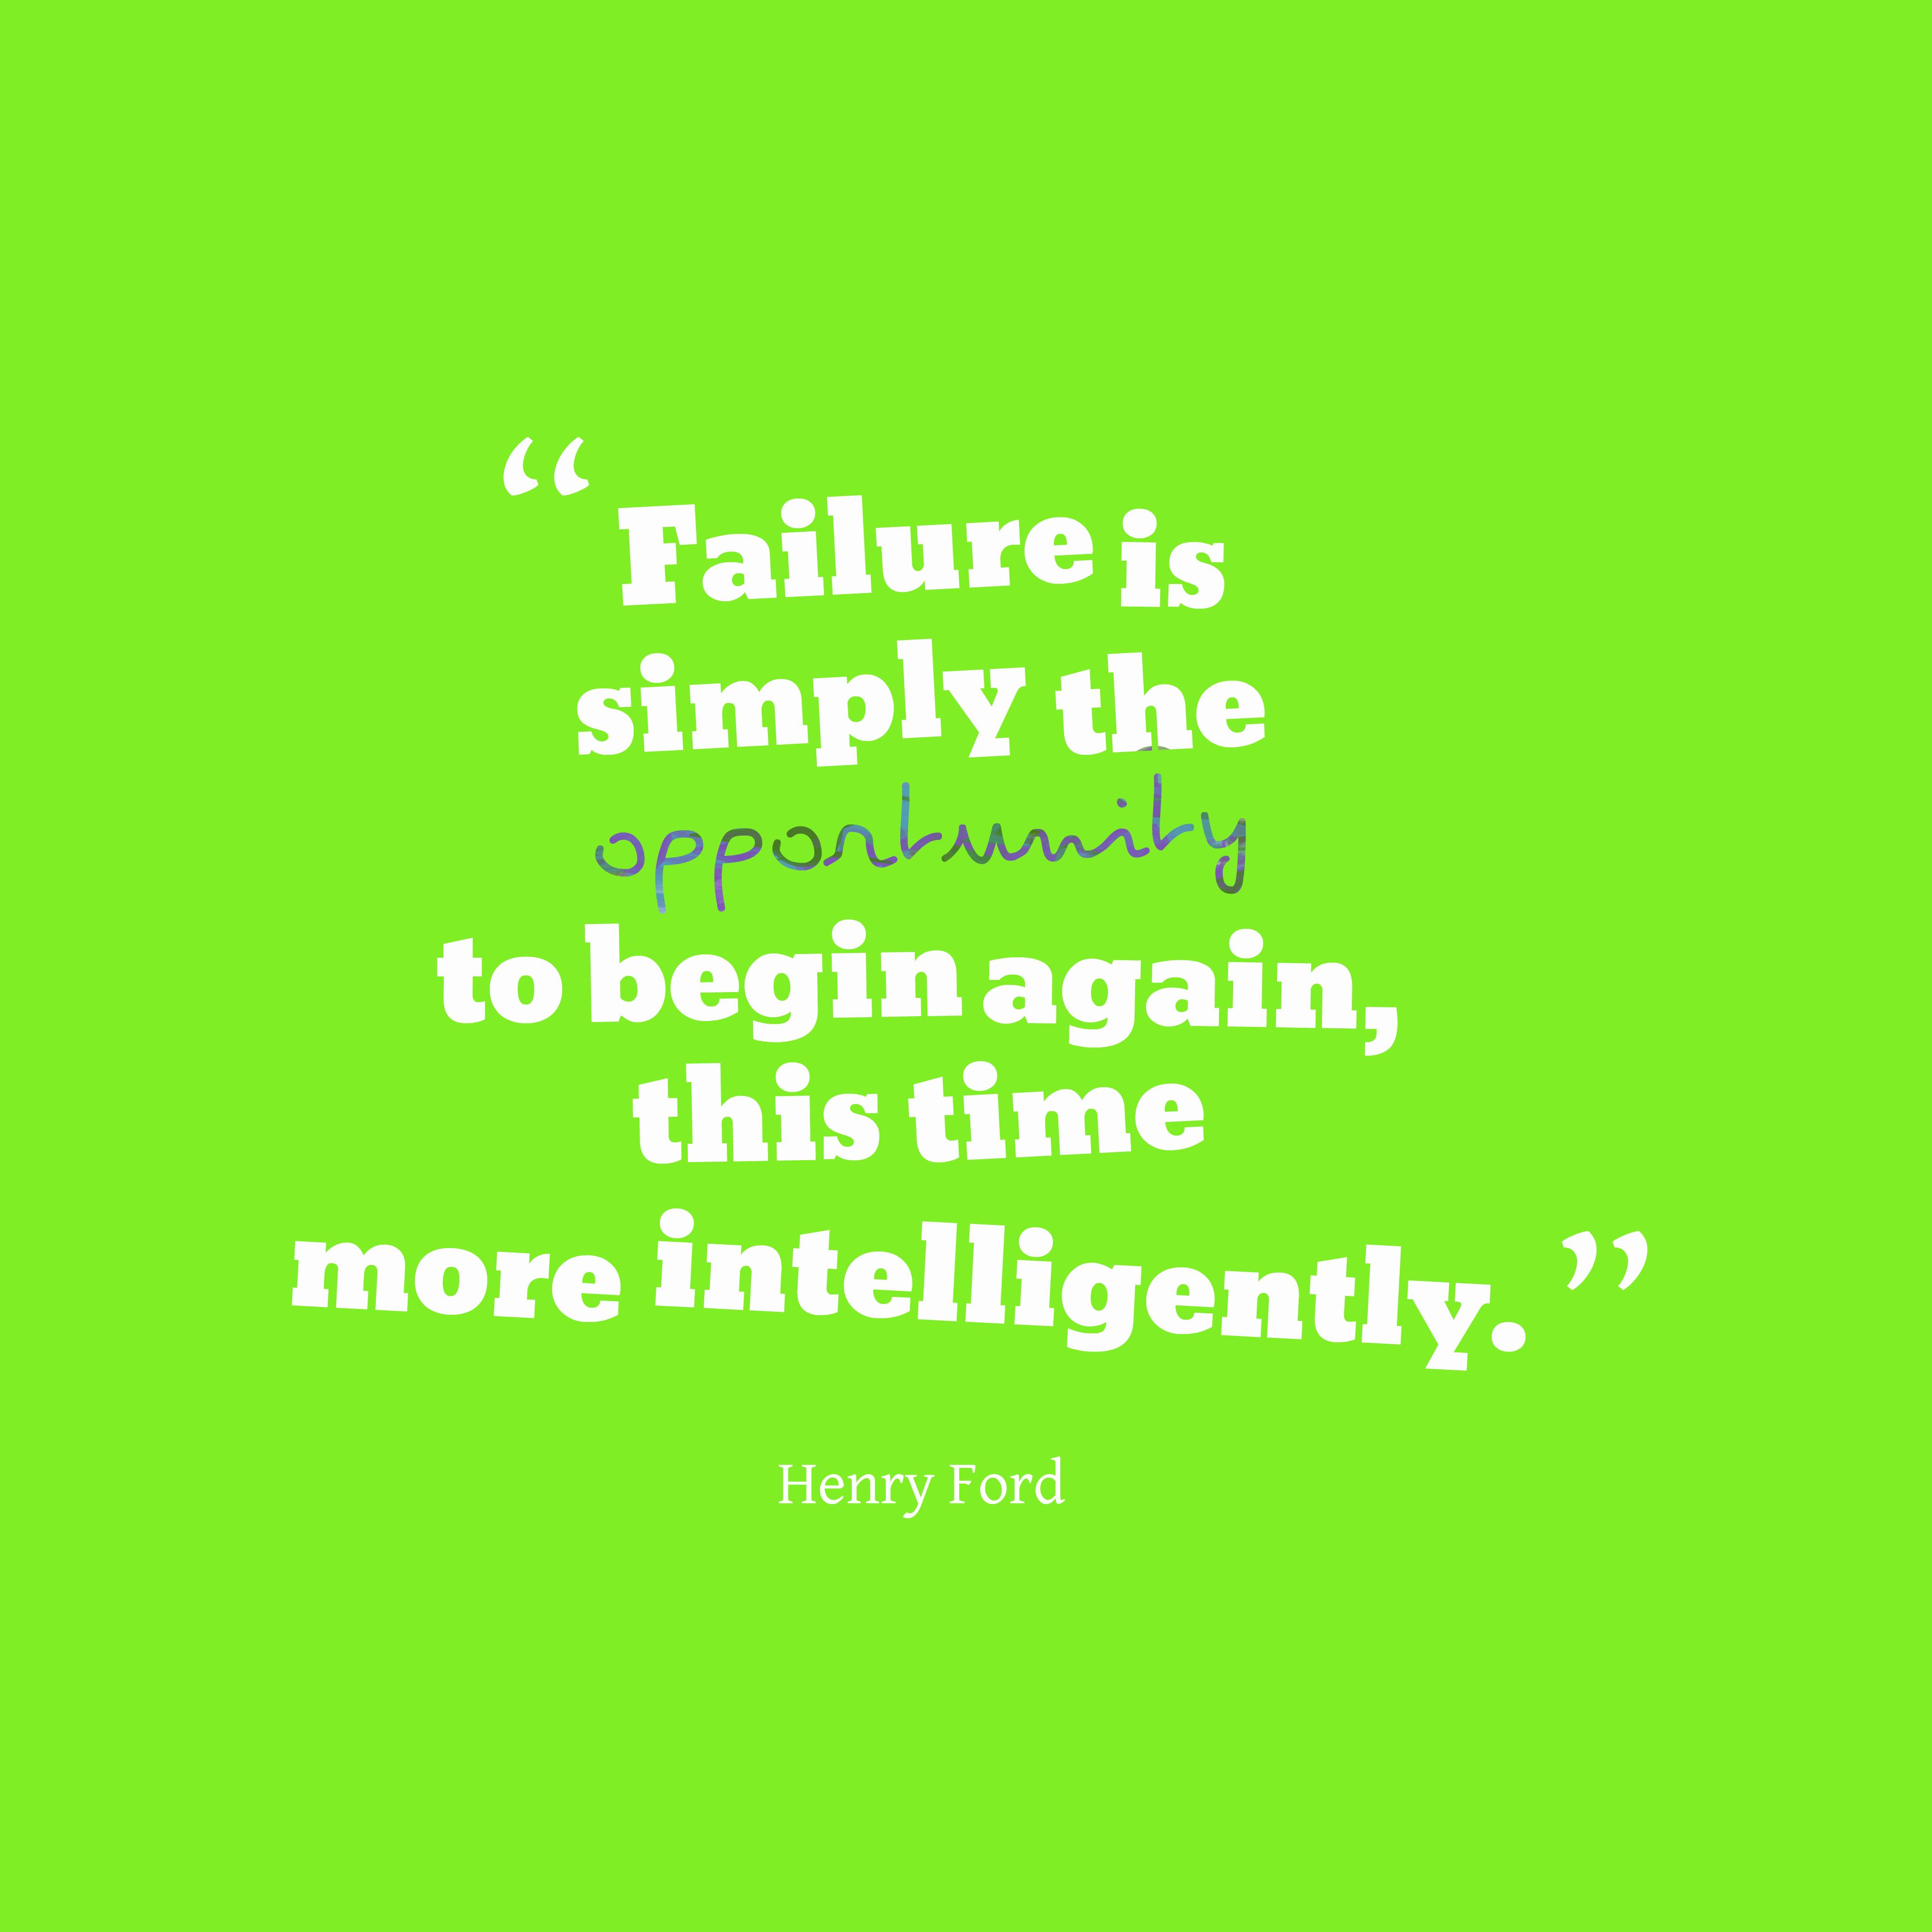 Inspirational Quotes About Failure: Im A Failure Quotes. QuotesGram